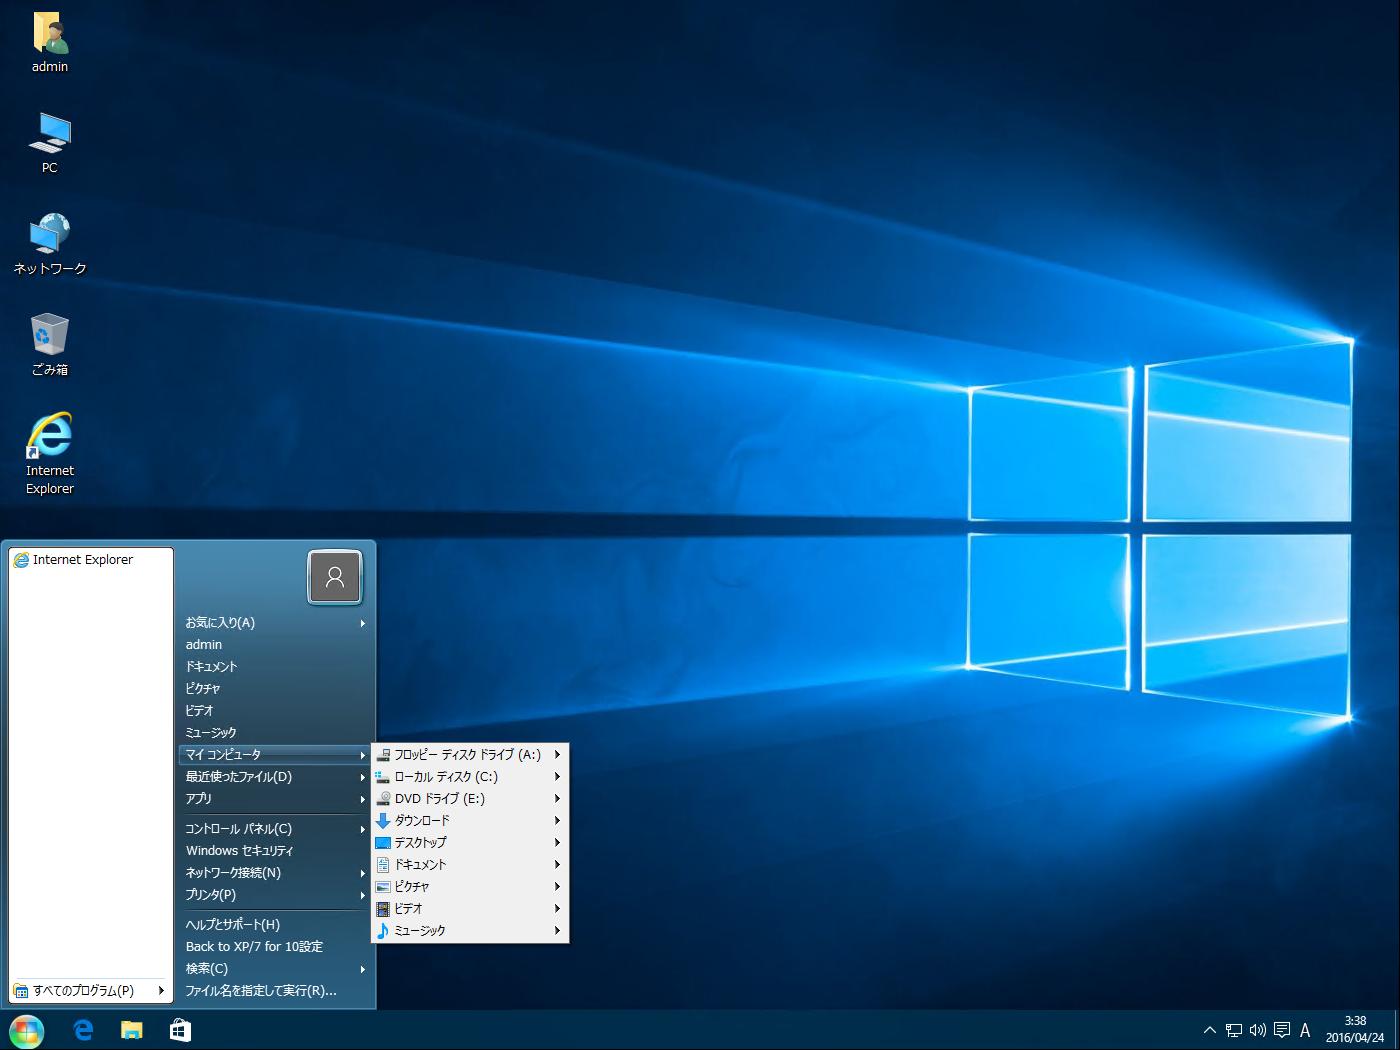 windows 10 1607 版